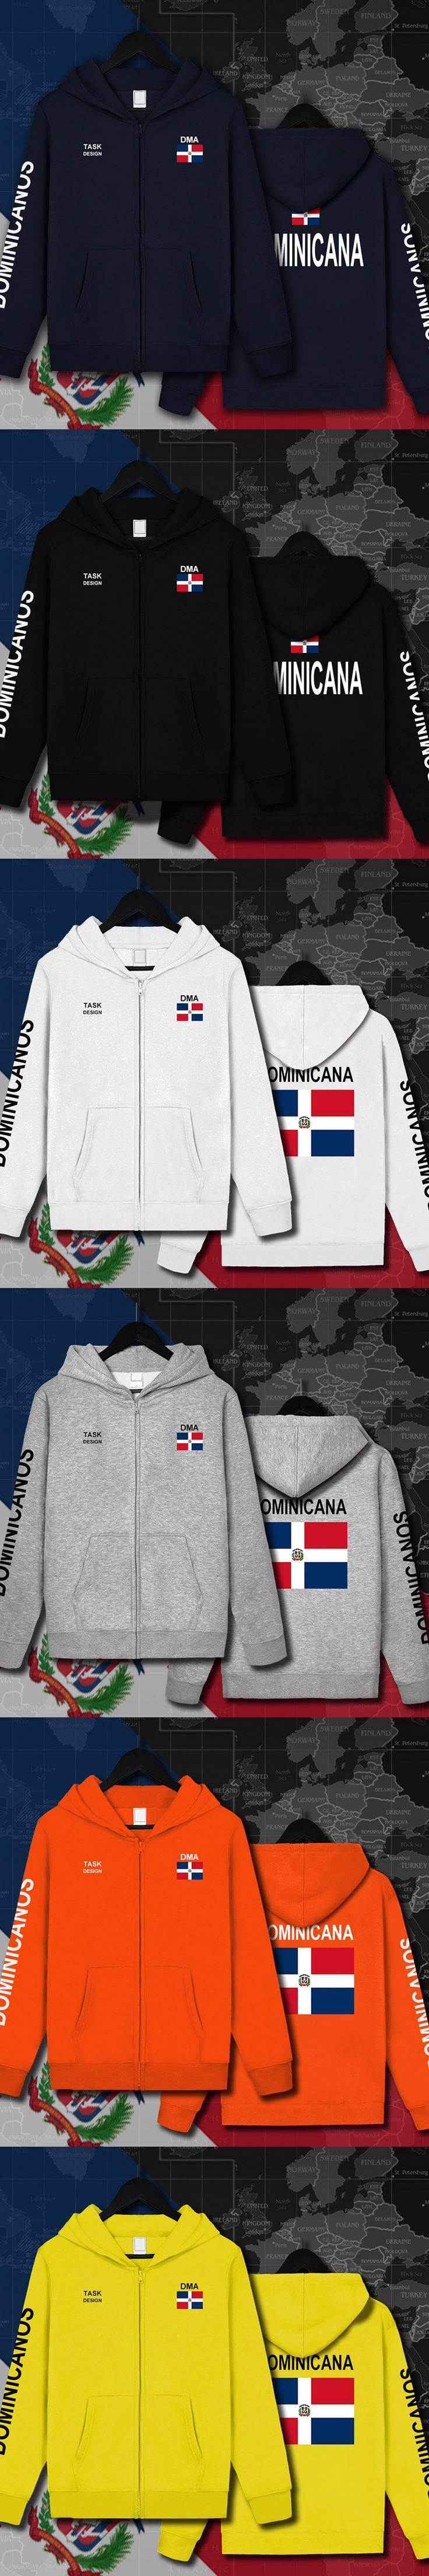 Dominican Republic Dominicana DOM Dominica mens Hoodies Sweatshirts hoodie jackets men streetwear hooded tracksuit sportswear